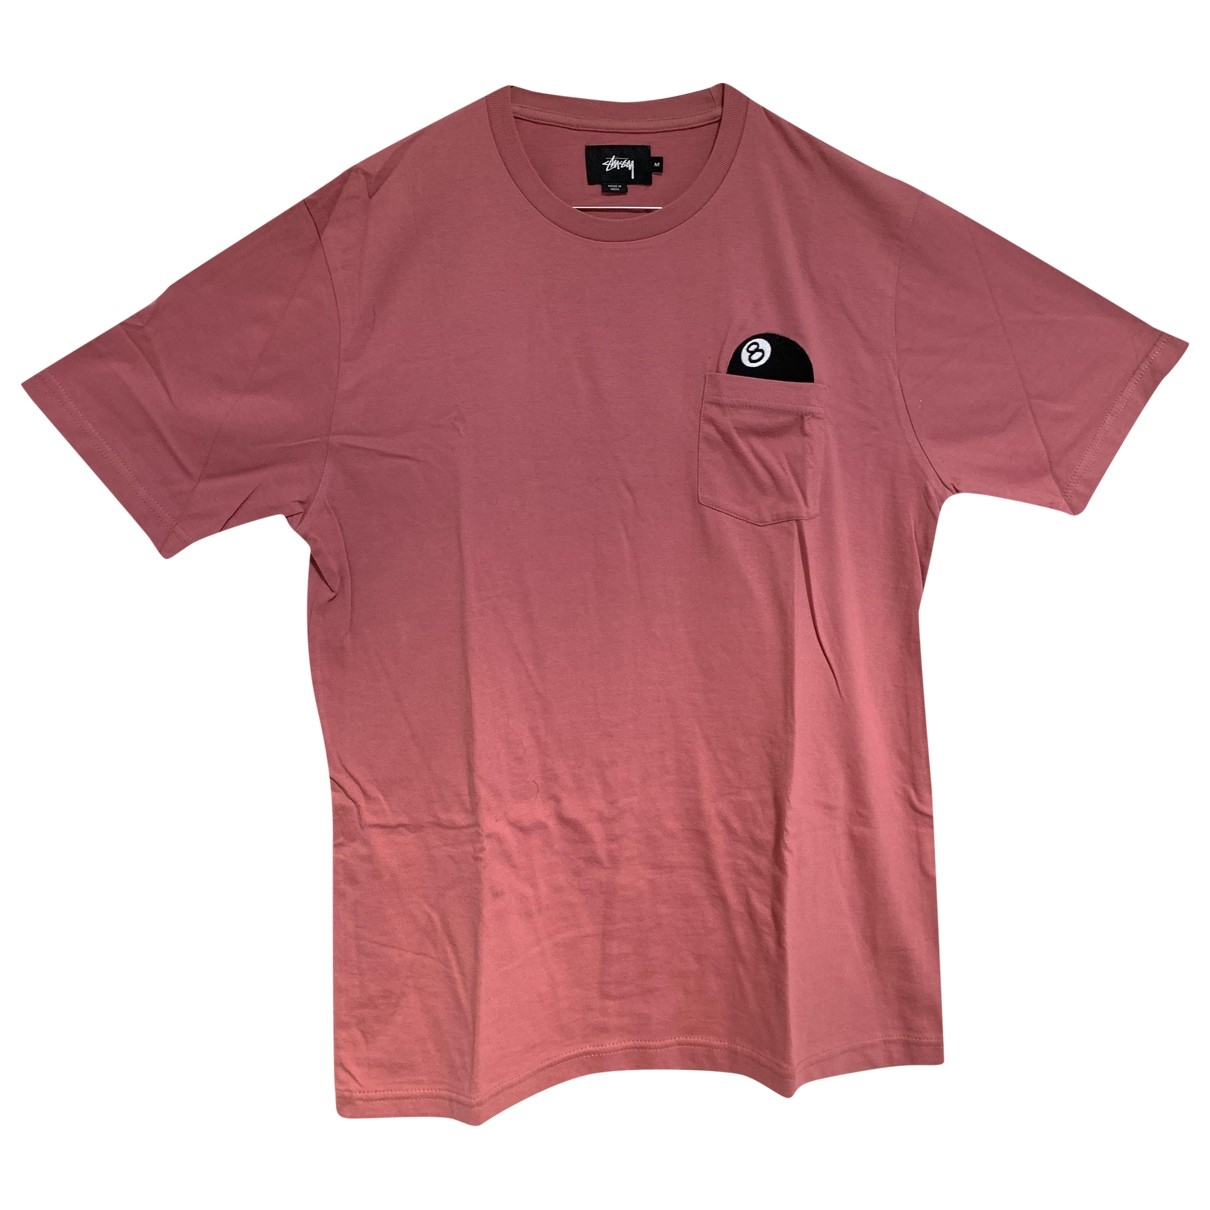 Stussy \N Pink Cotton T-shirts for Men M International